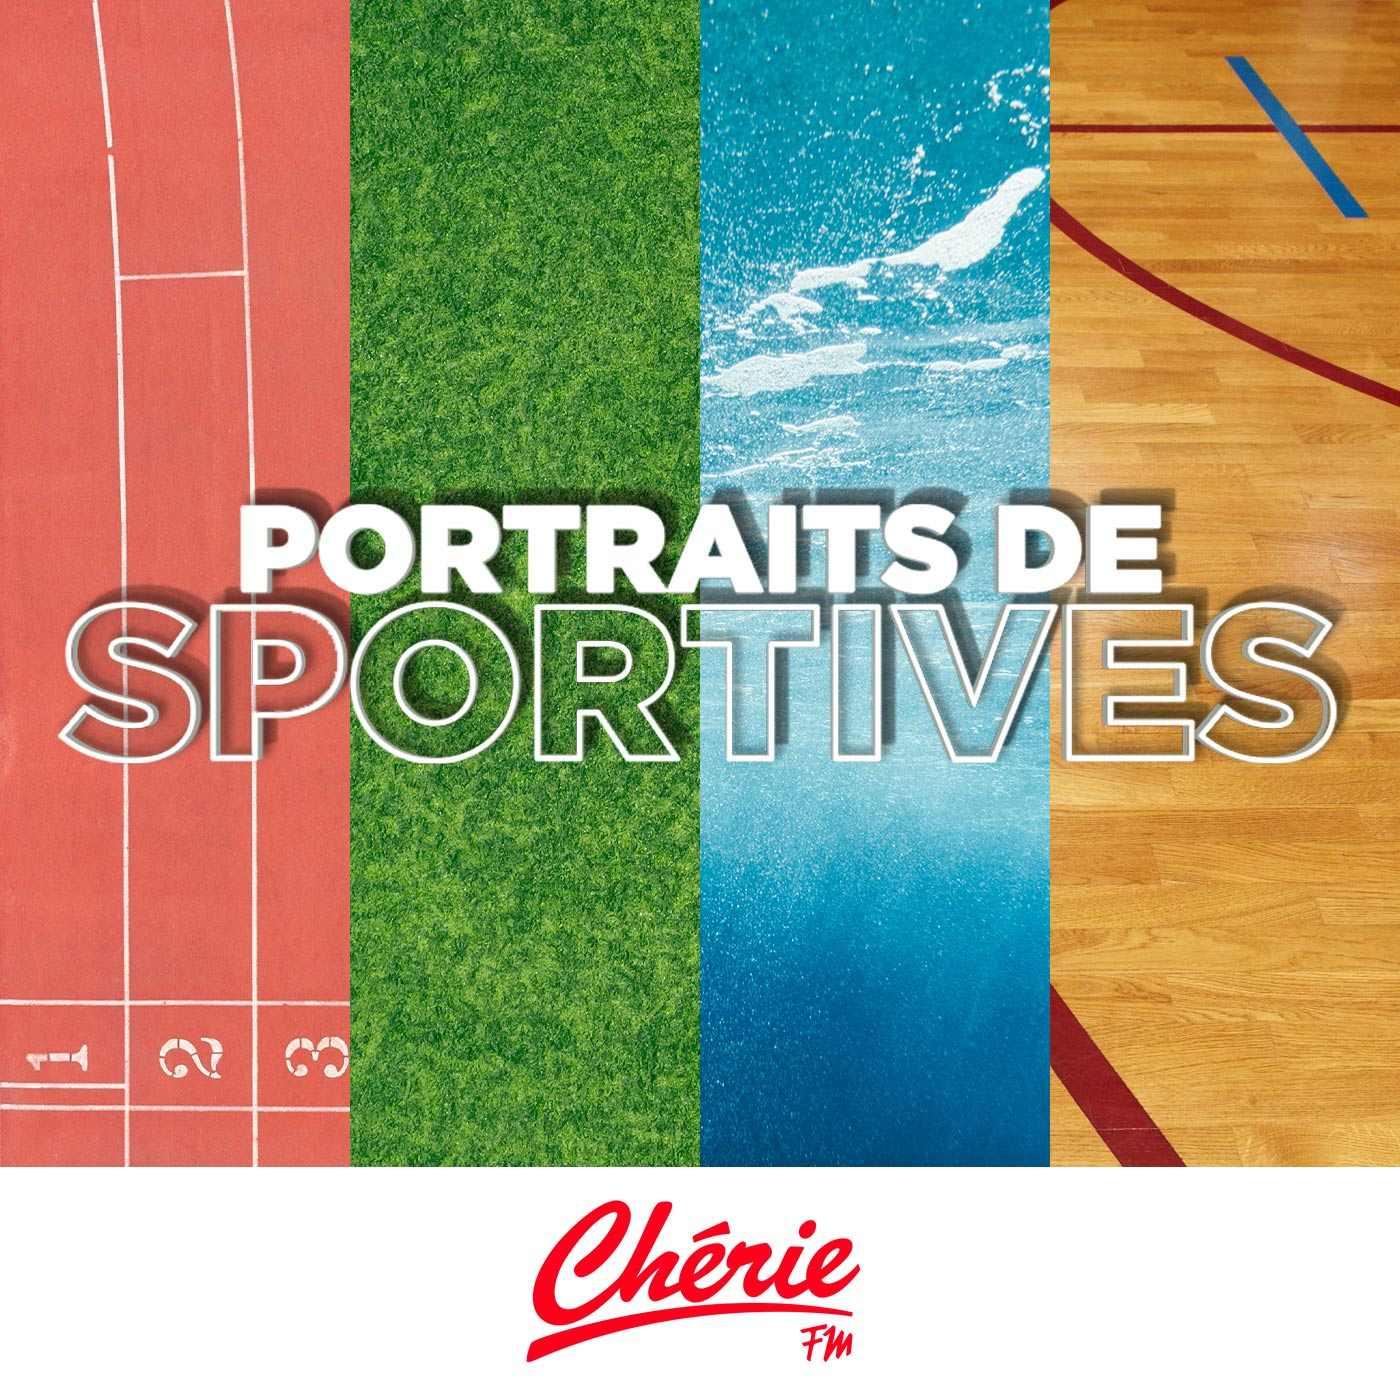 Portraits de sportives